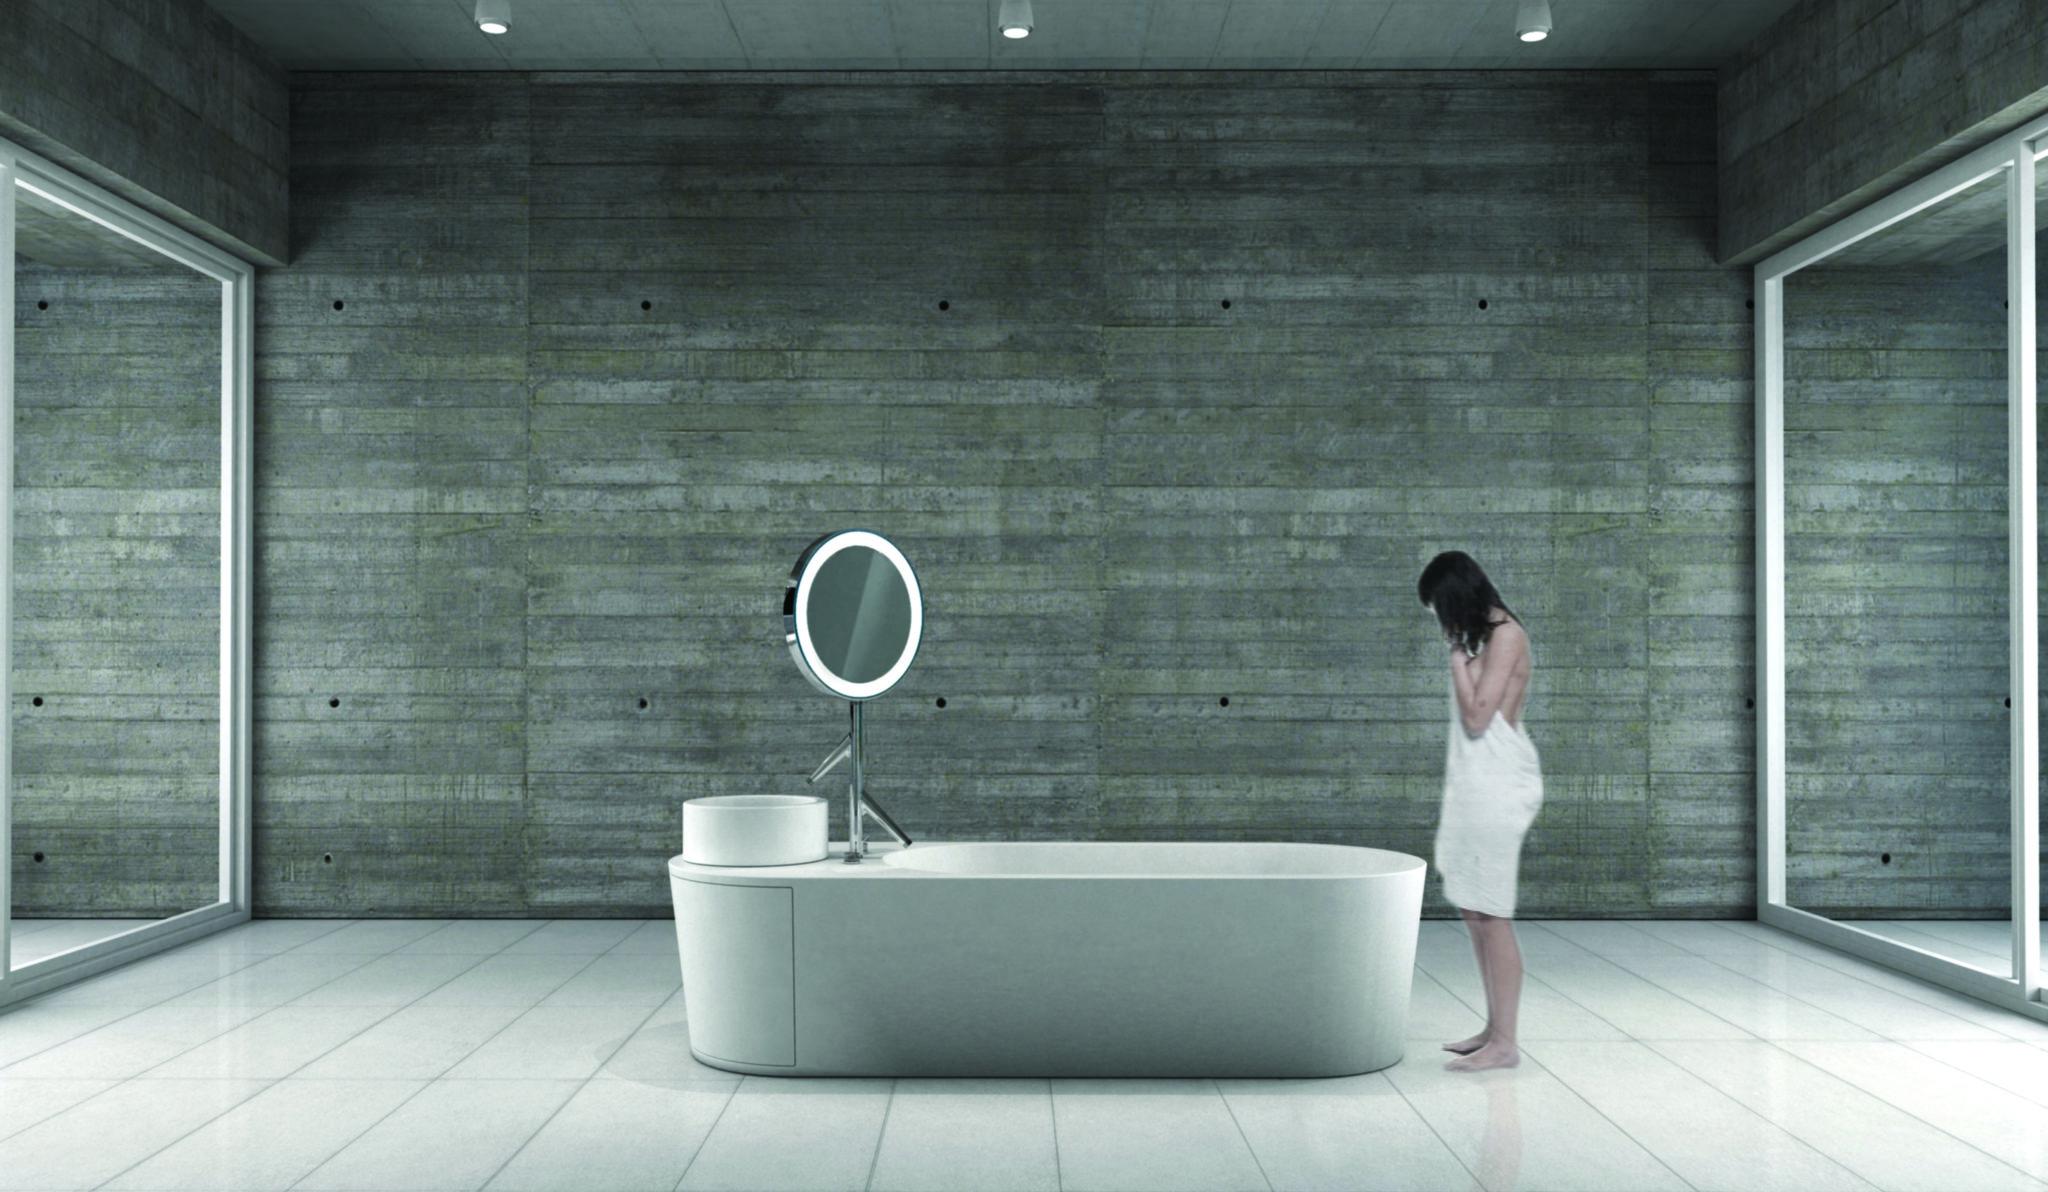 Futurespace 39 S Gavin Harris Wins Reece Bathroom Innovation Award 2012 The Interiors Addict